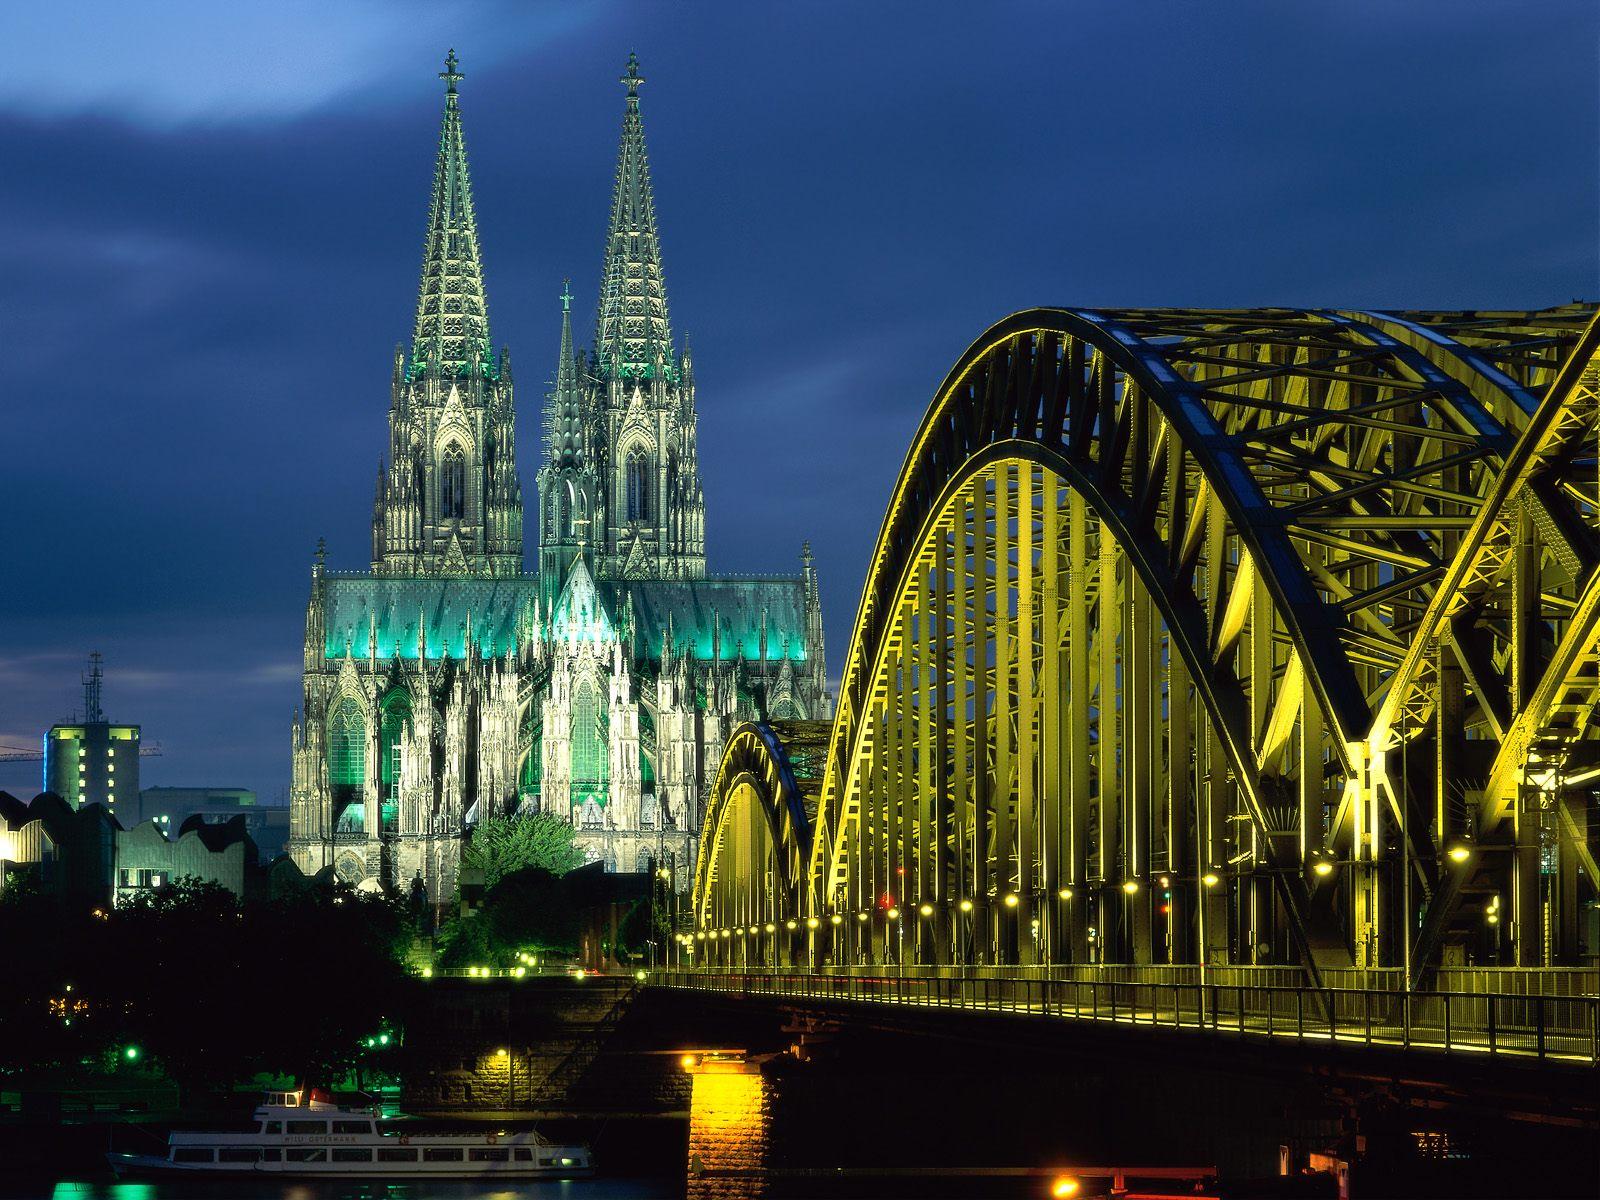 http://4.bp.blogspot.com/-W9TPTw-fZs4/TcGYRsMW3SI/AAAAAAAABOM/h91zh1zercs/s1600/Germany-Wallpaper_0405201106.jpg